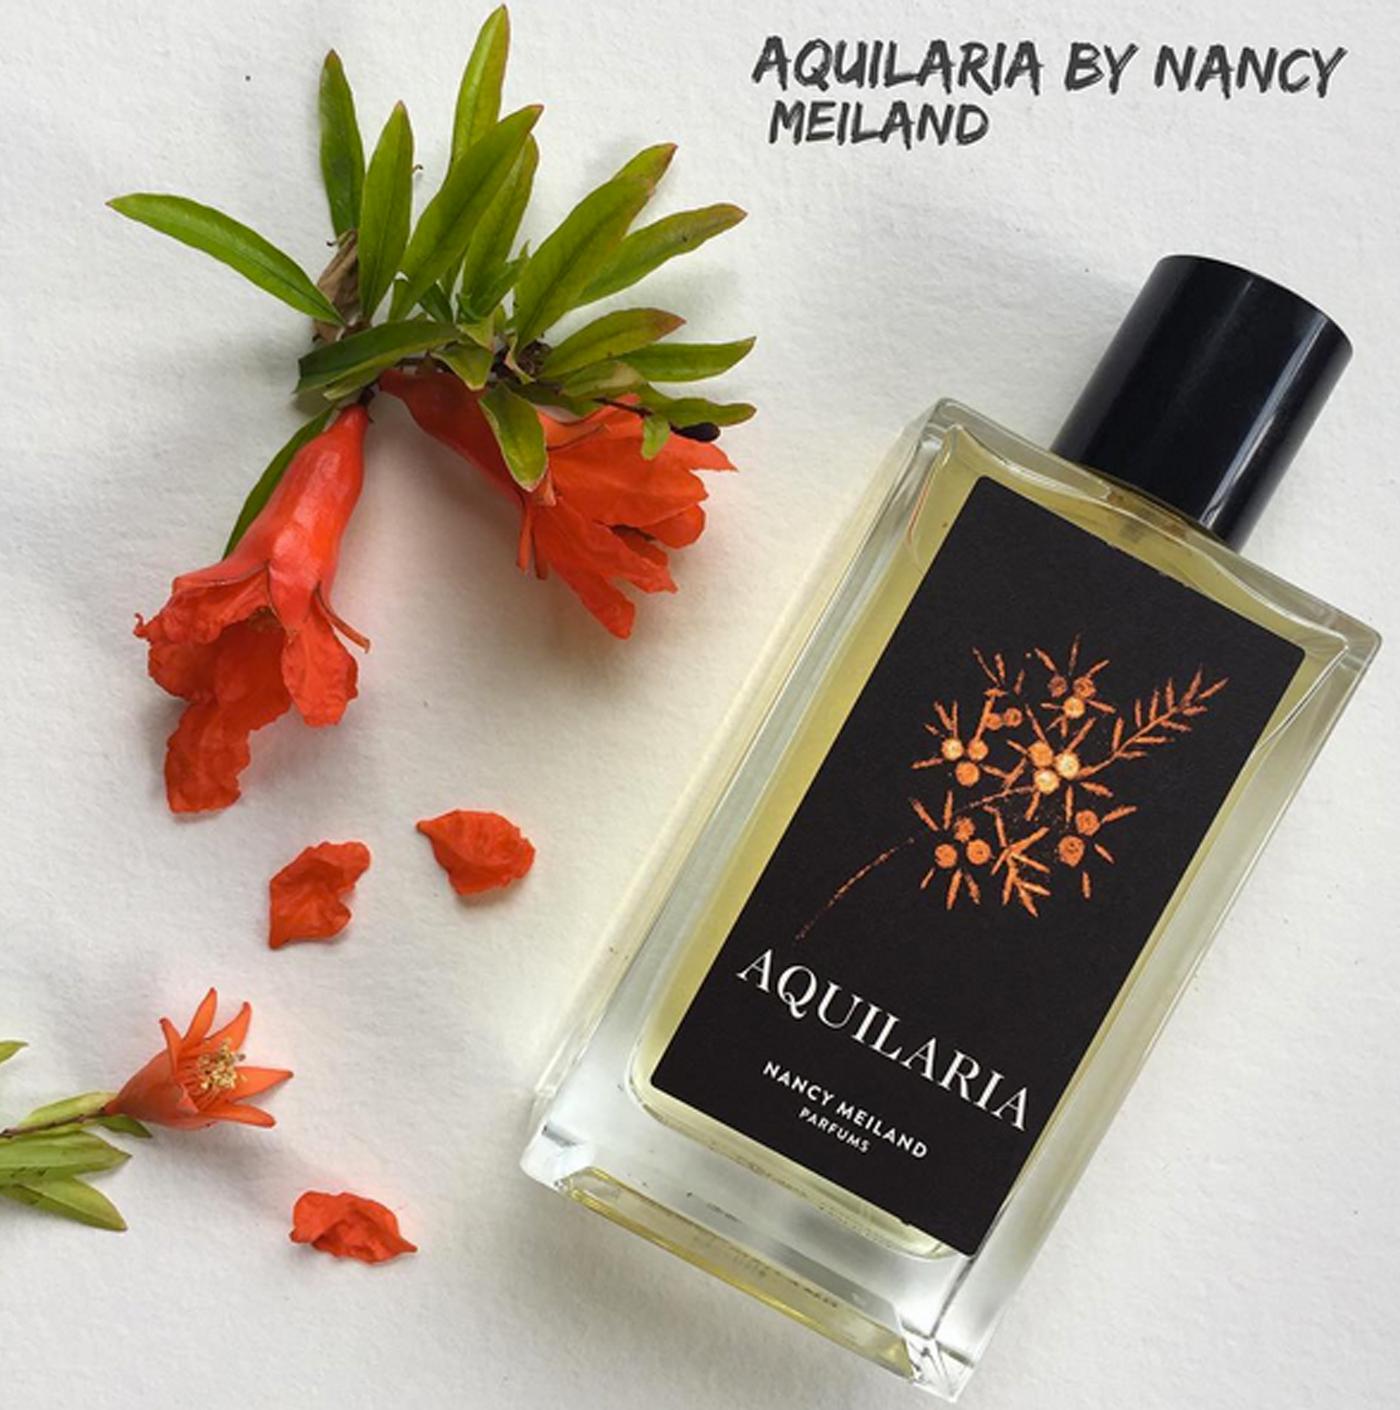 aquilaria-nancymeiland-wewearperfume